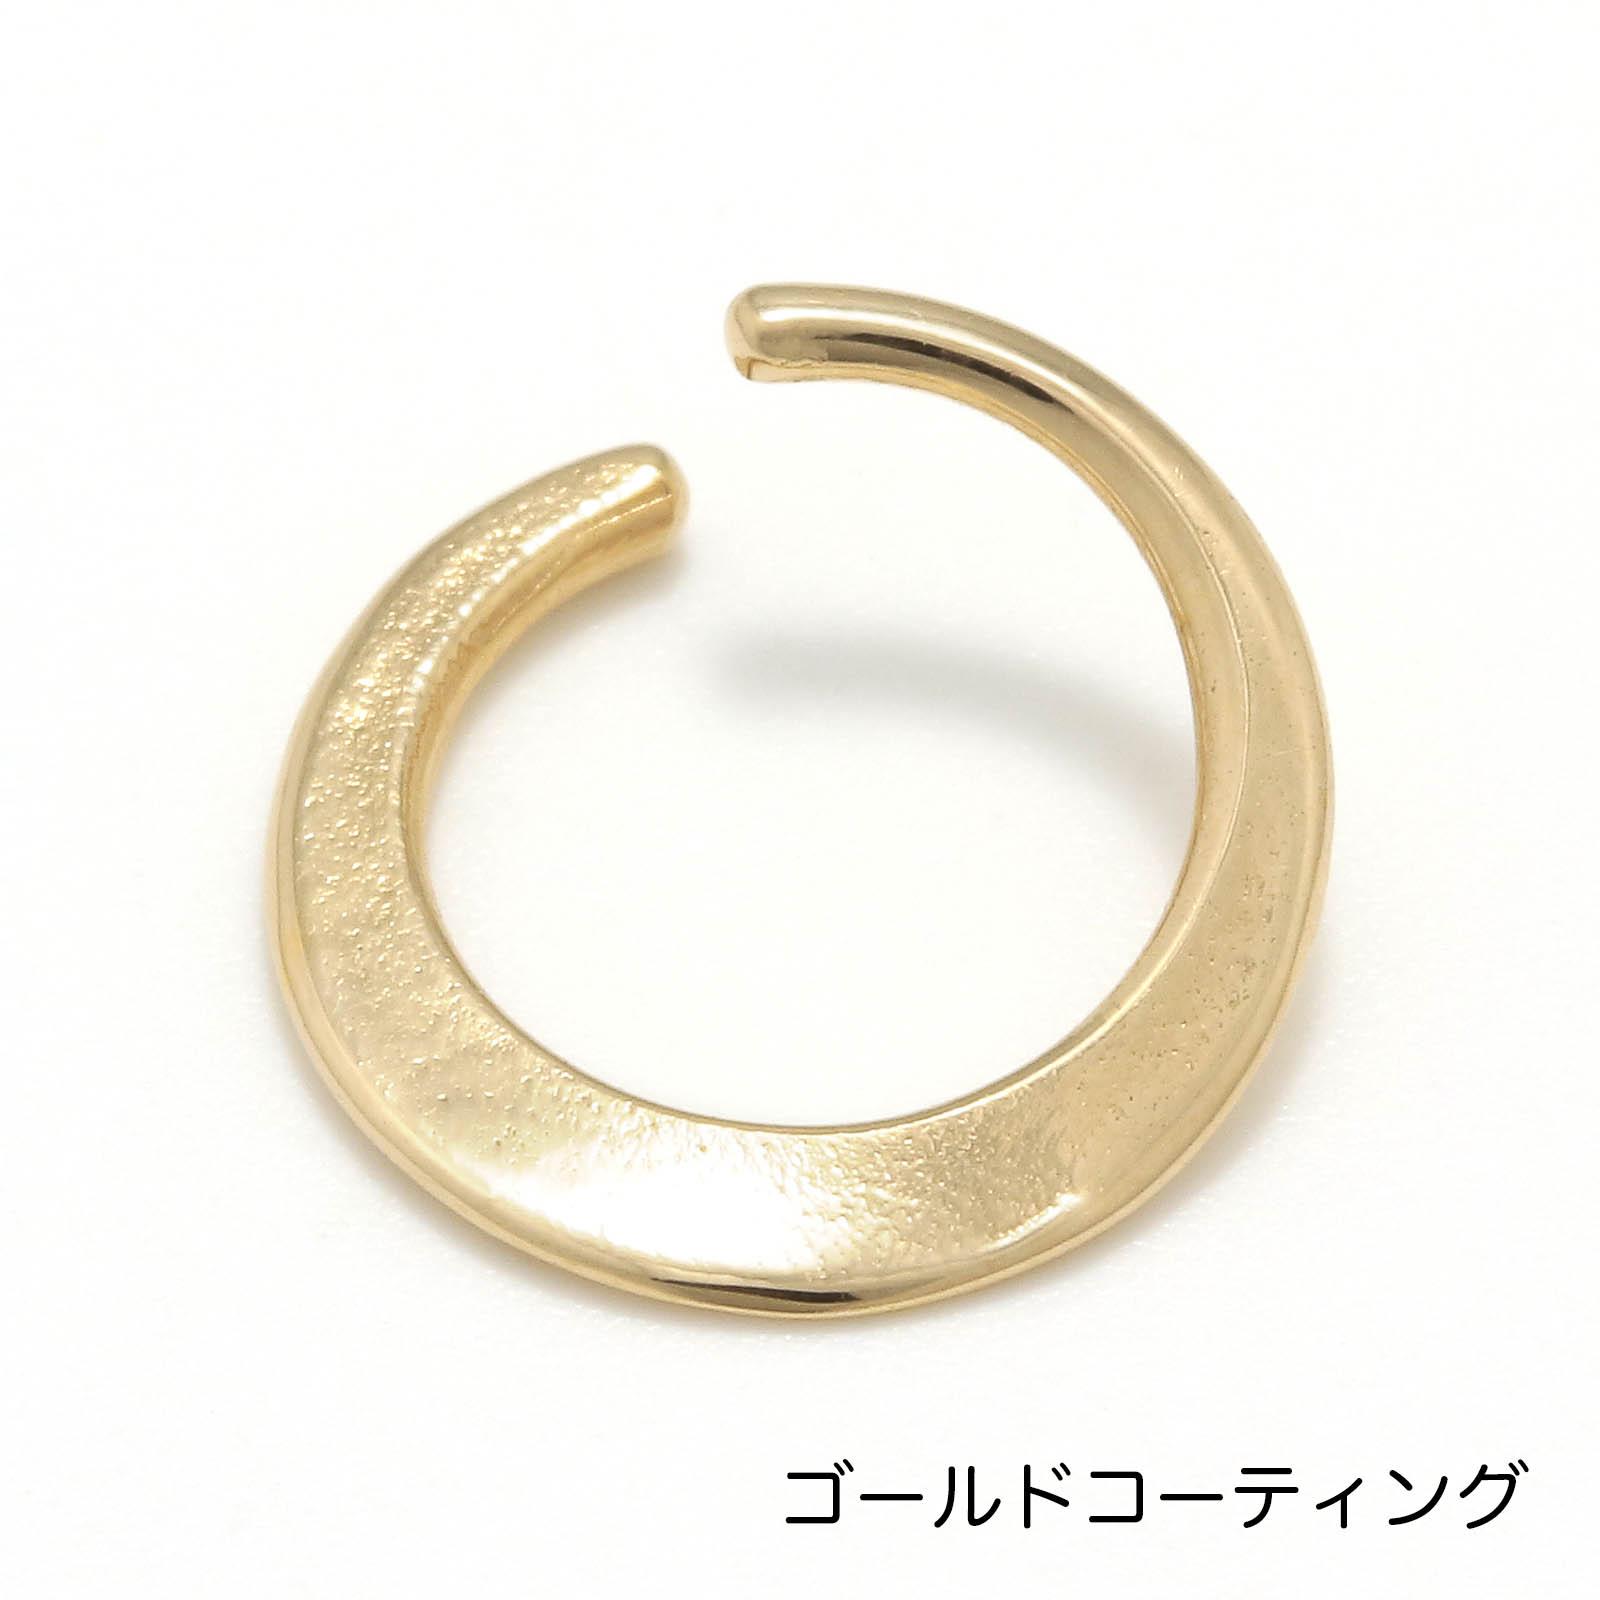 Small Hook Pierce